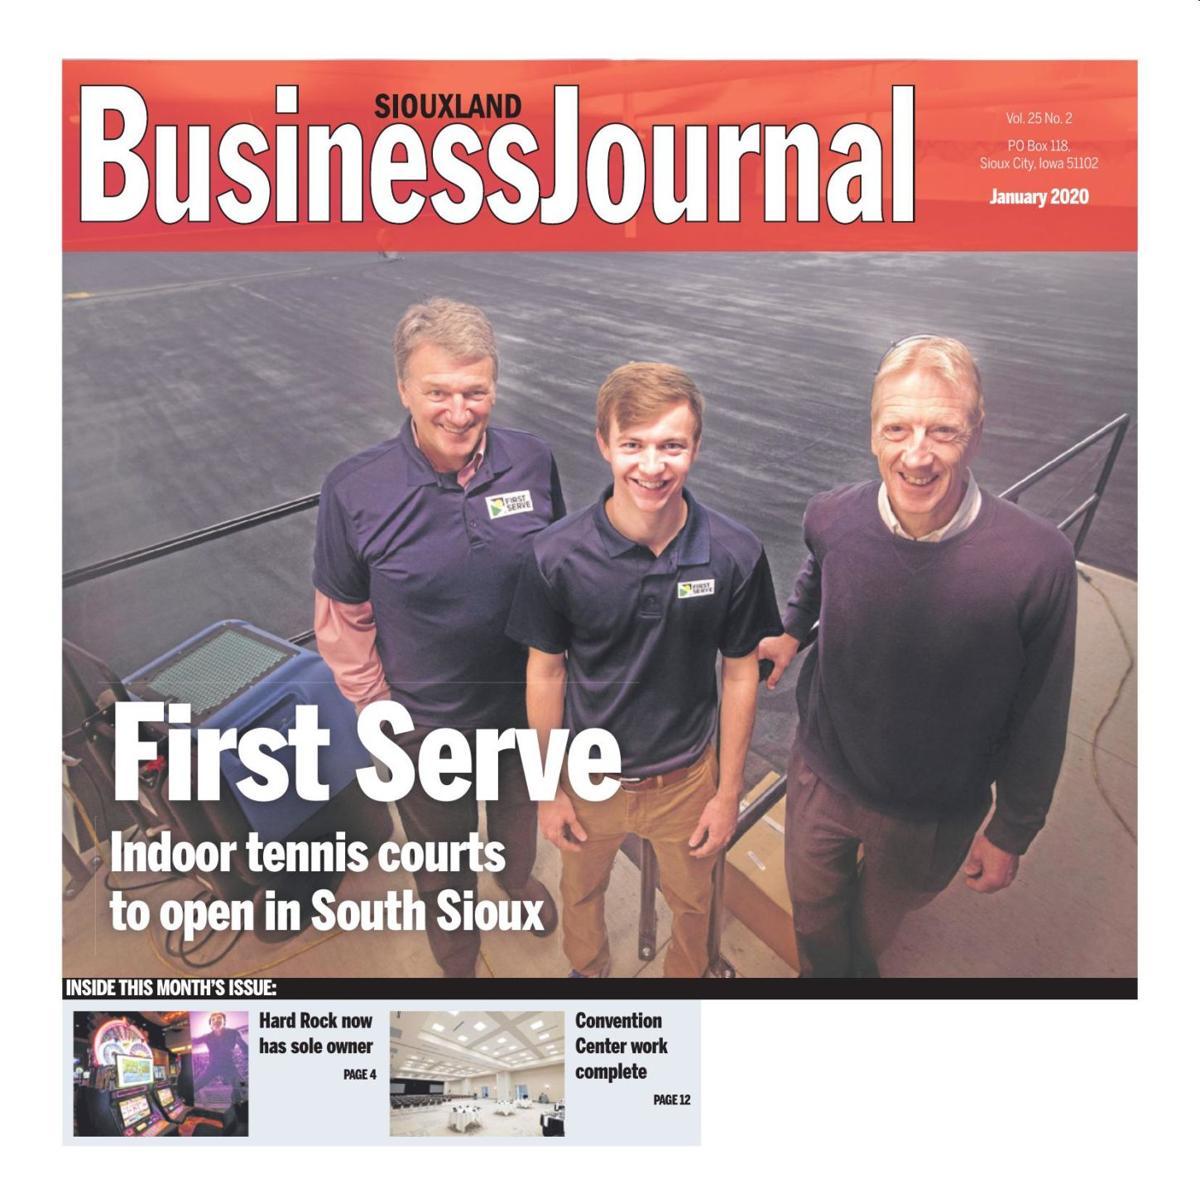 Siouxland Business Journal - January 2020